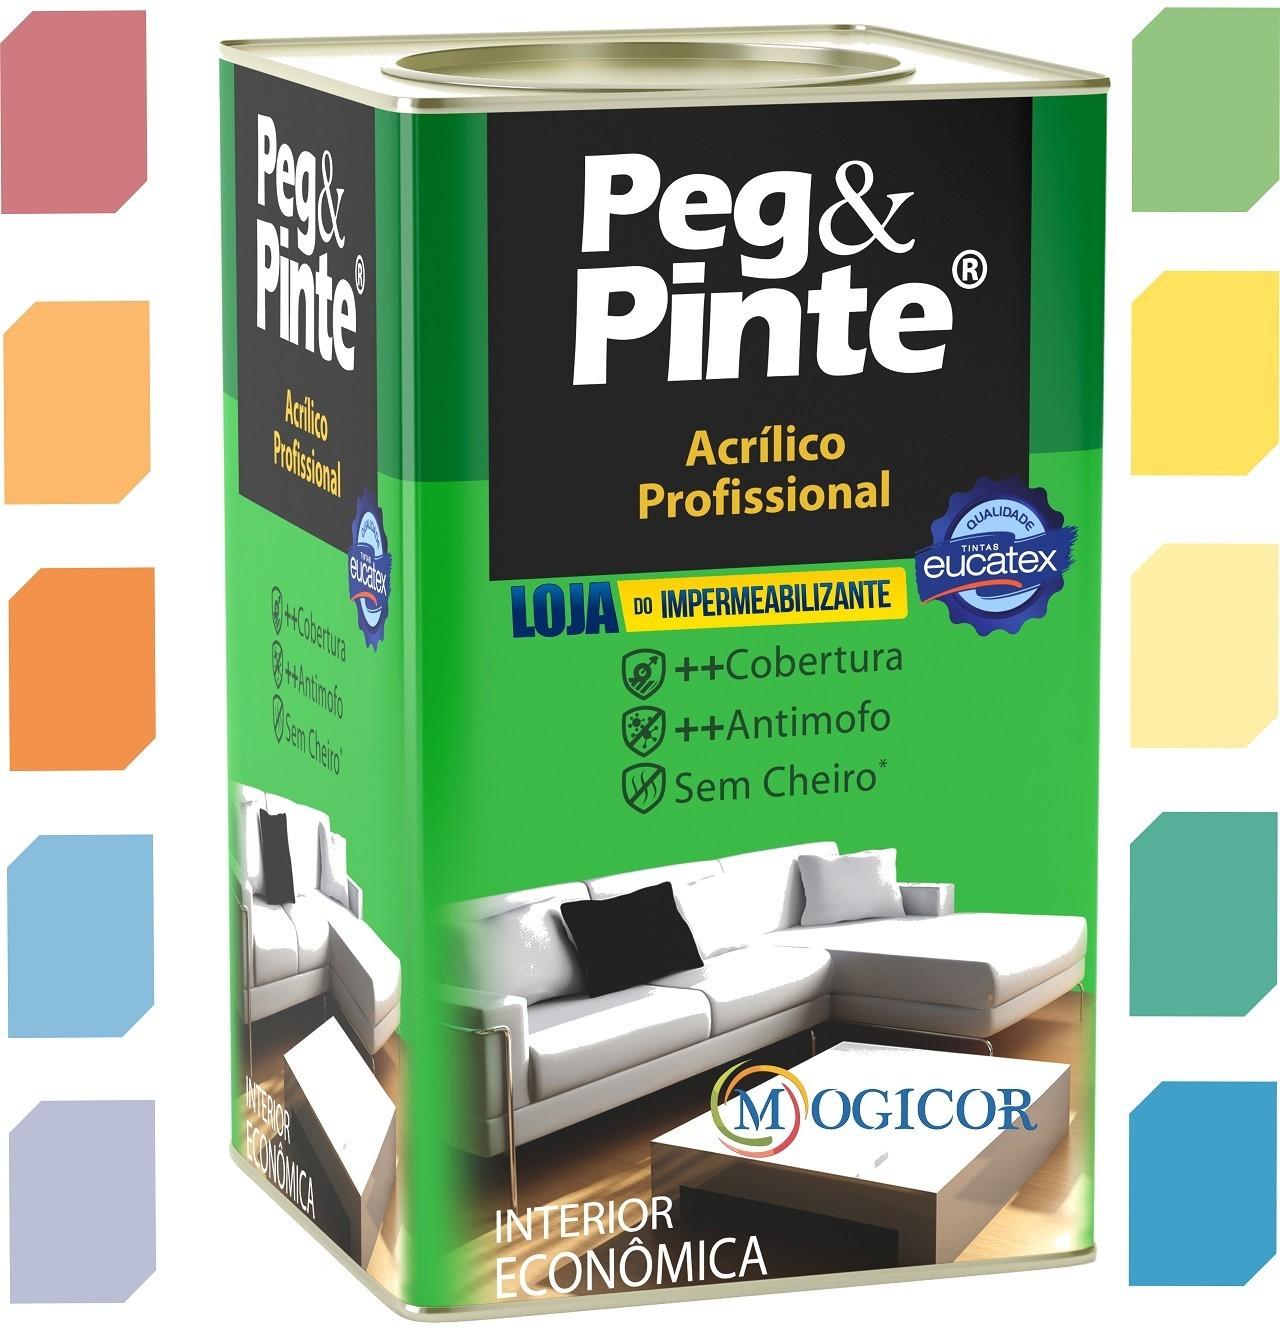 Tinta Acrílica Profissional Peg & Pinte 18l Cores - Eucatex